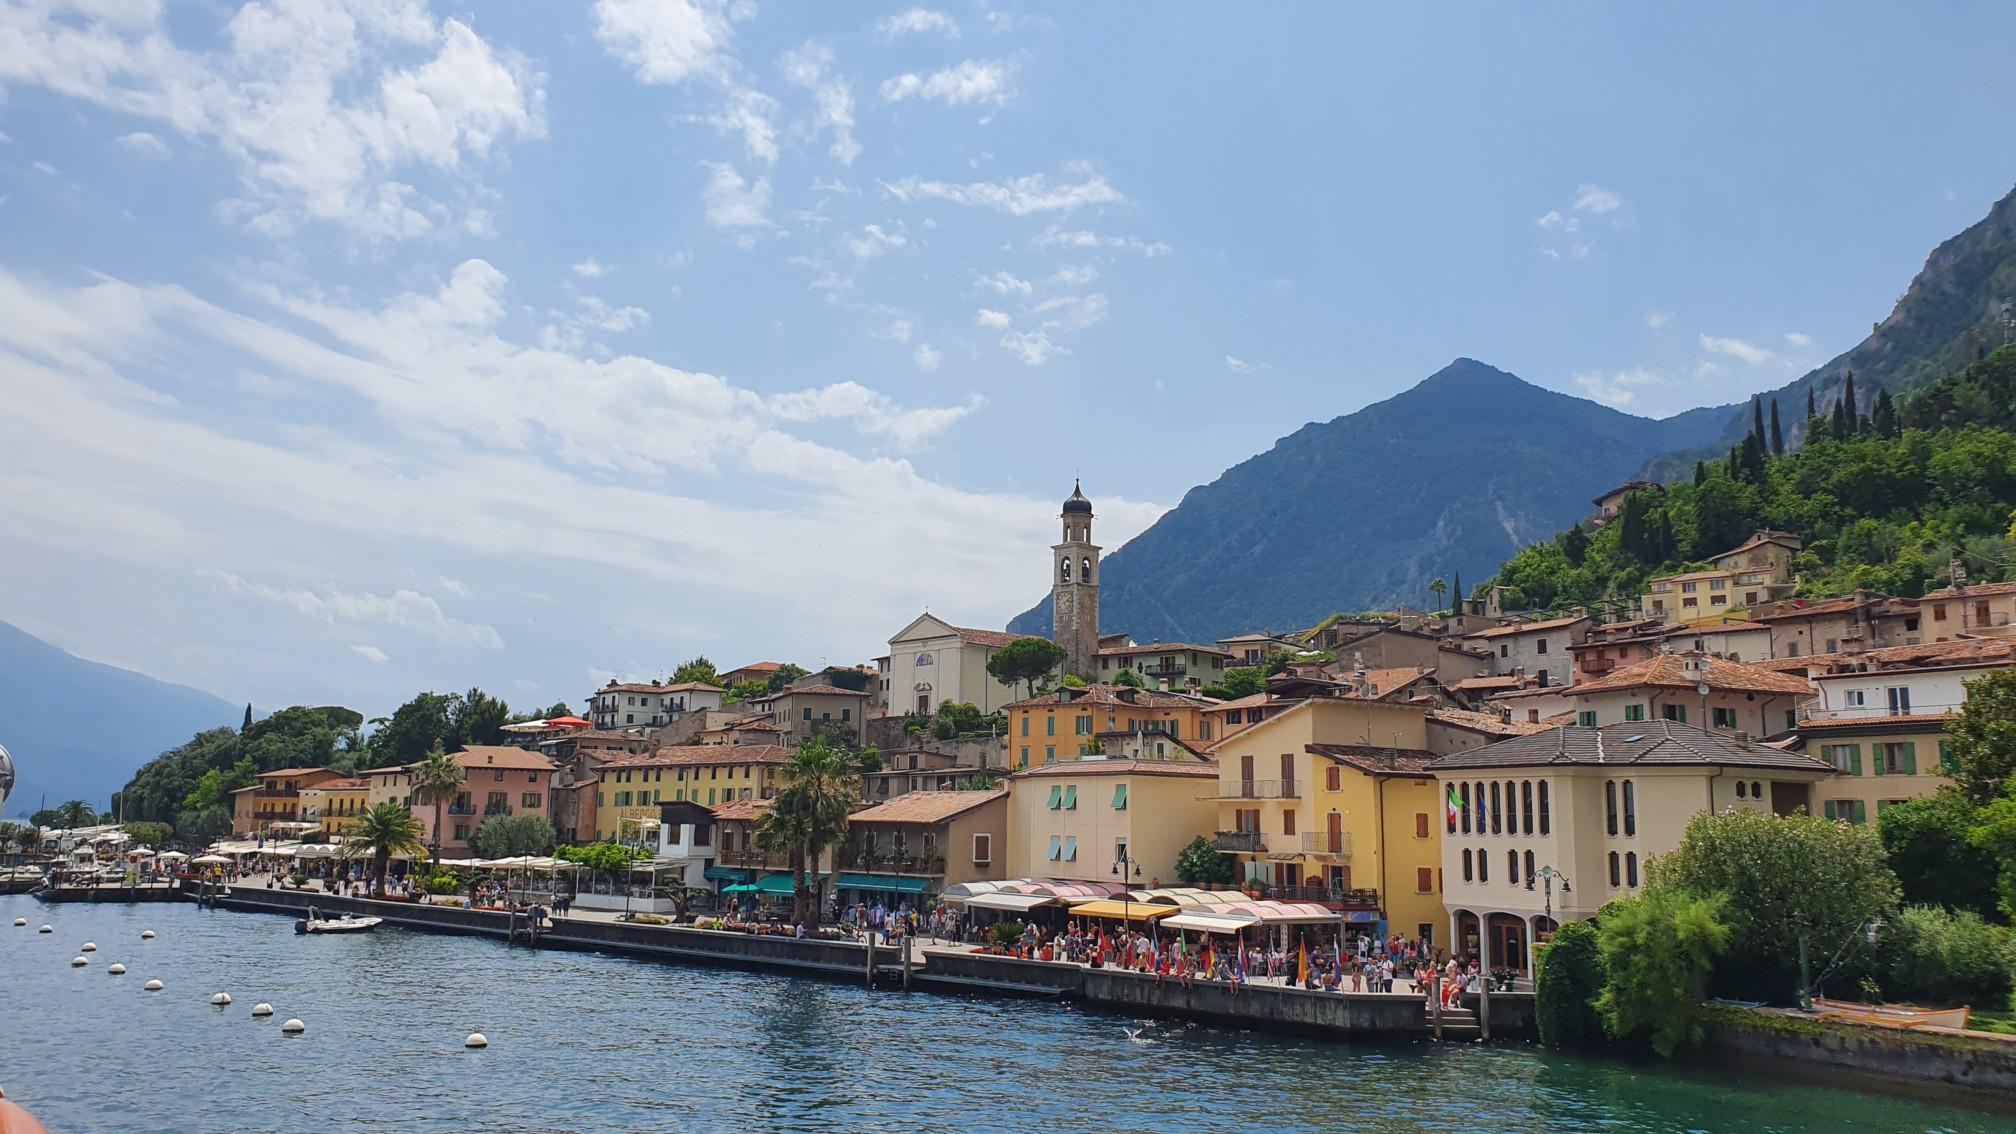 Limine Sul Garda